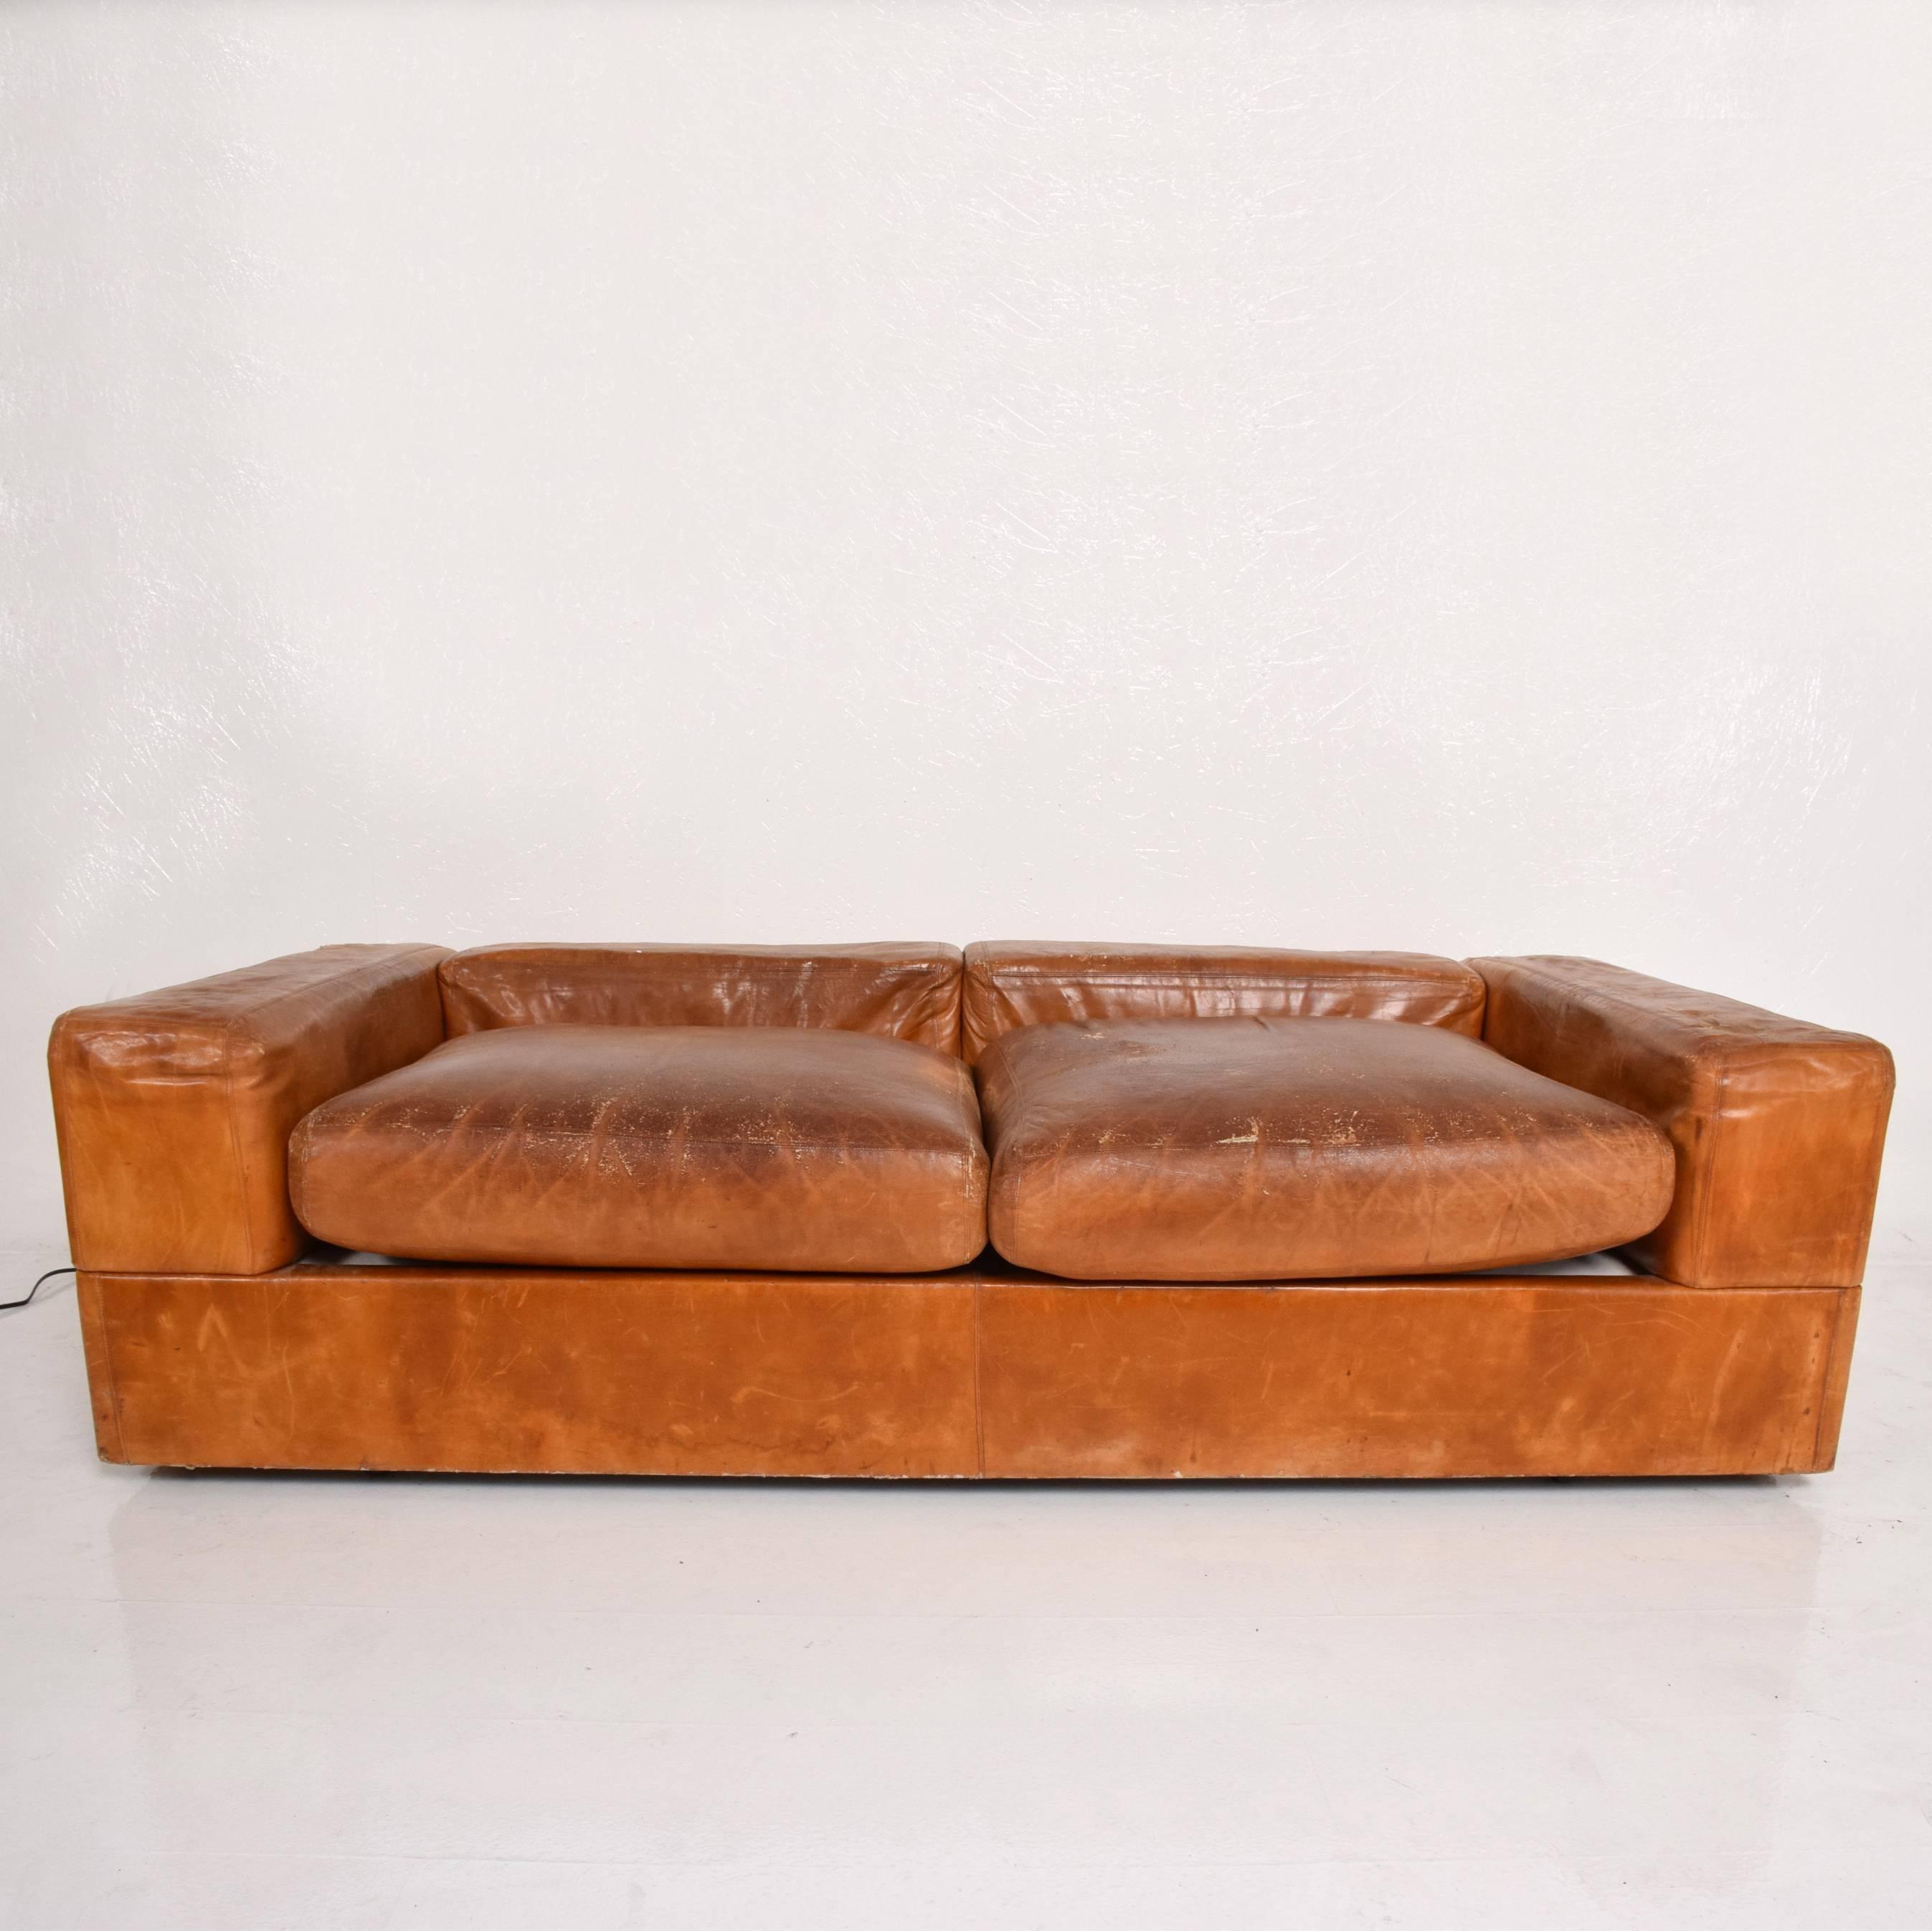 Genial Mid Century Modern Italian Leather Sofa Bed By Tito Agnolli